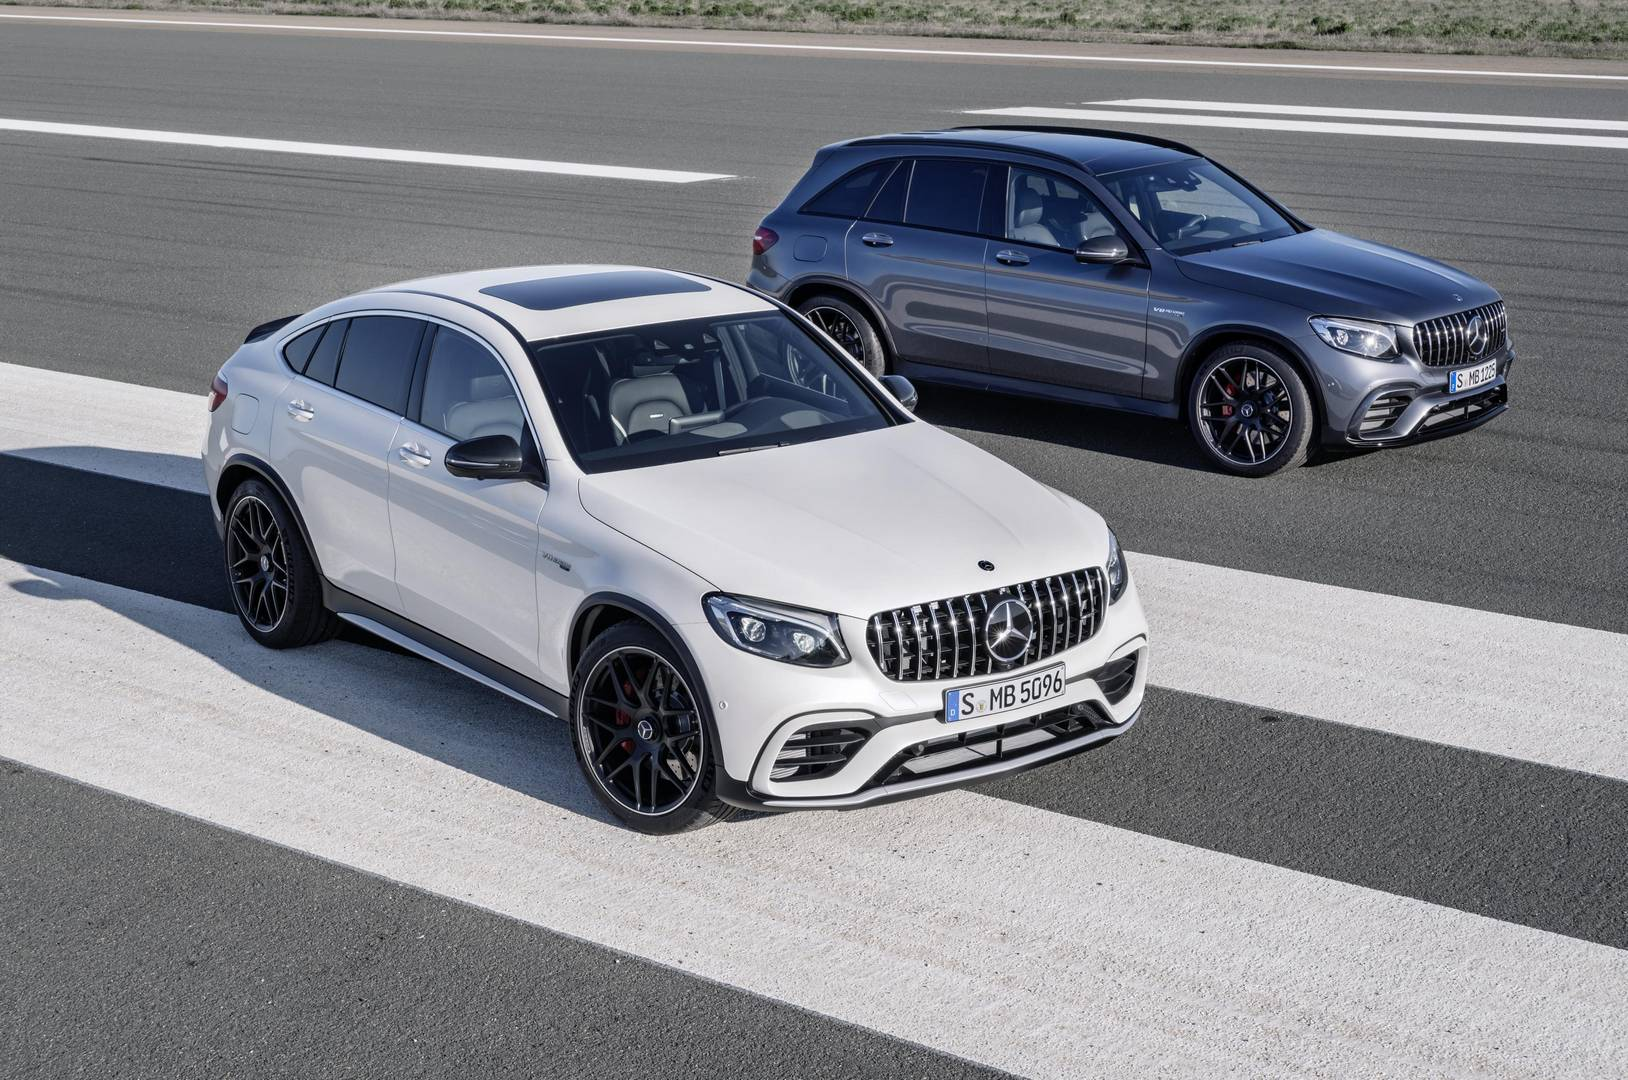 https://storage.googleapis.com/gtspirit/uploads/2017/04/Mercedes-AMG-GLC-63-S-Coupe-18.jpg